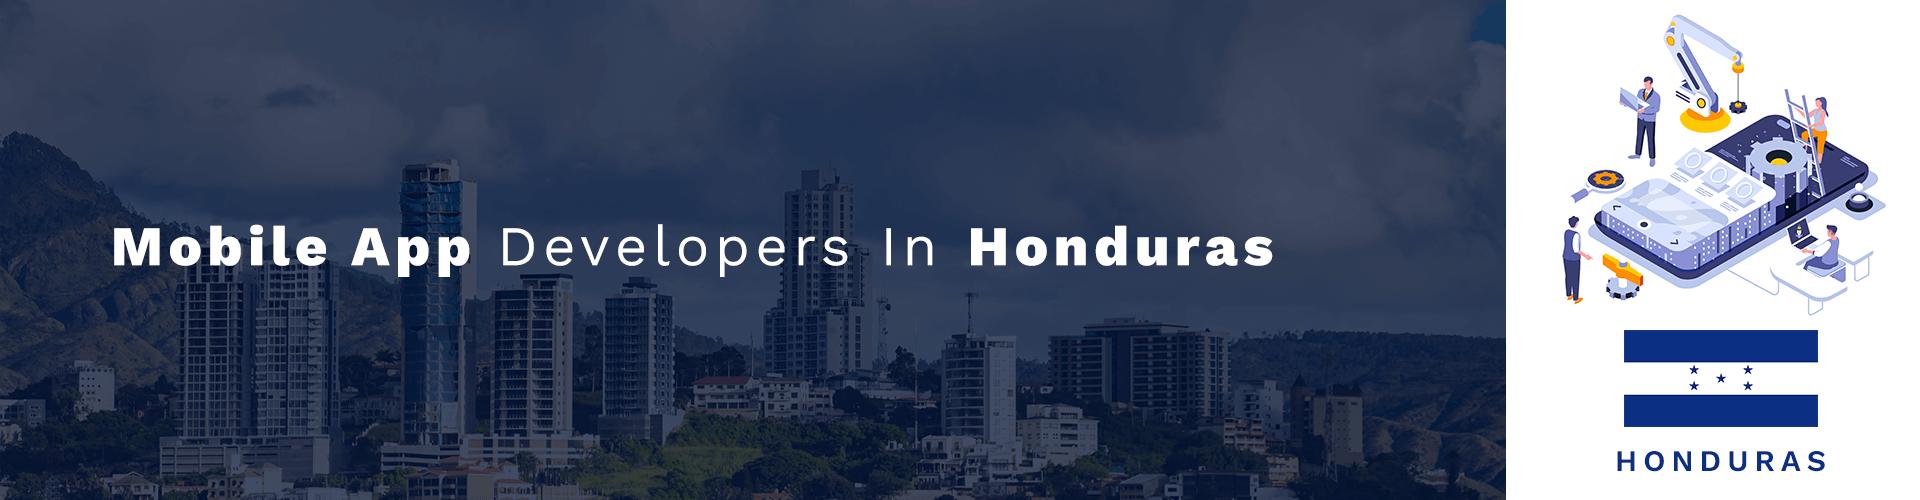 app developers honduras